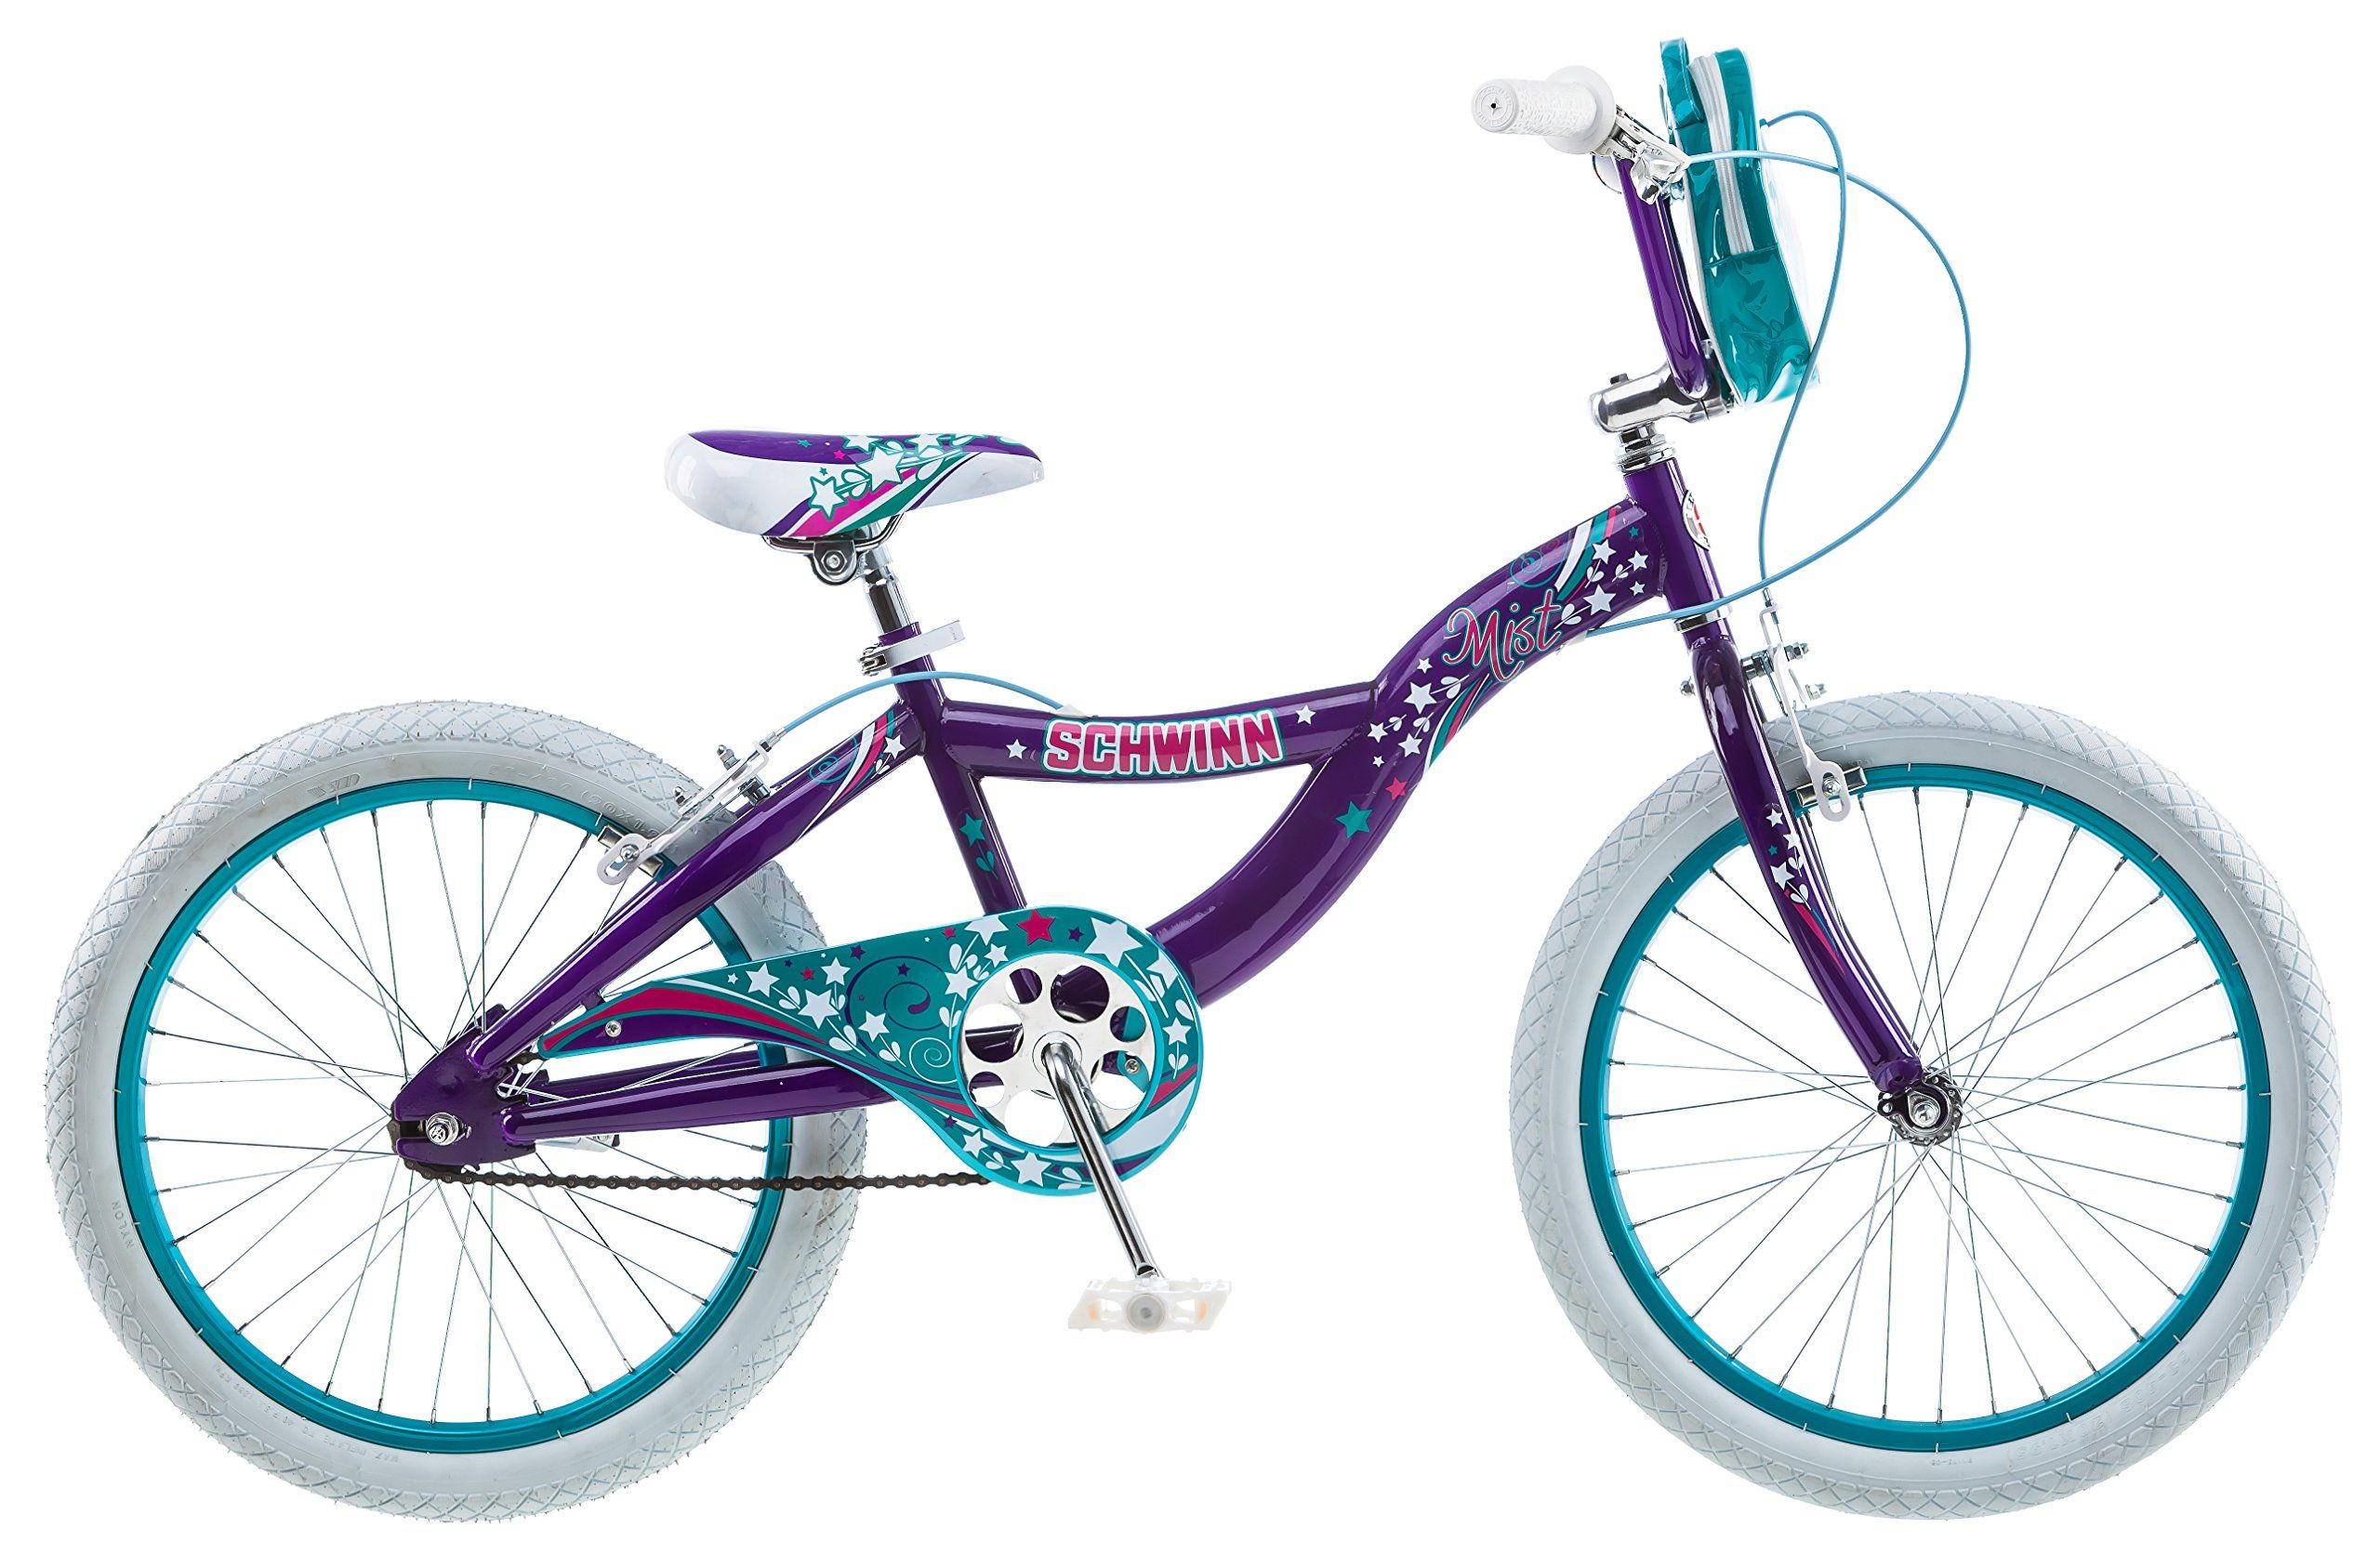 2f8f0d46e74 Amazon.com : Schwinn Girl's Mist Bicycle, 20-Inch, Purple : Sports &  Outdoors